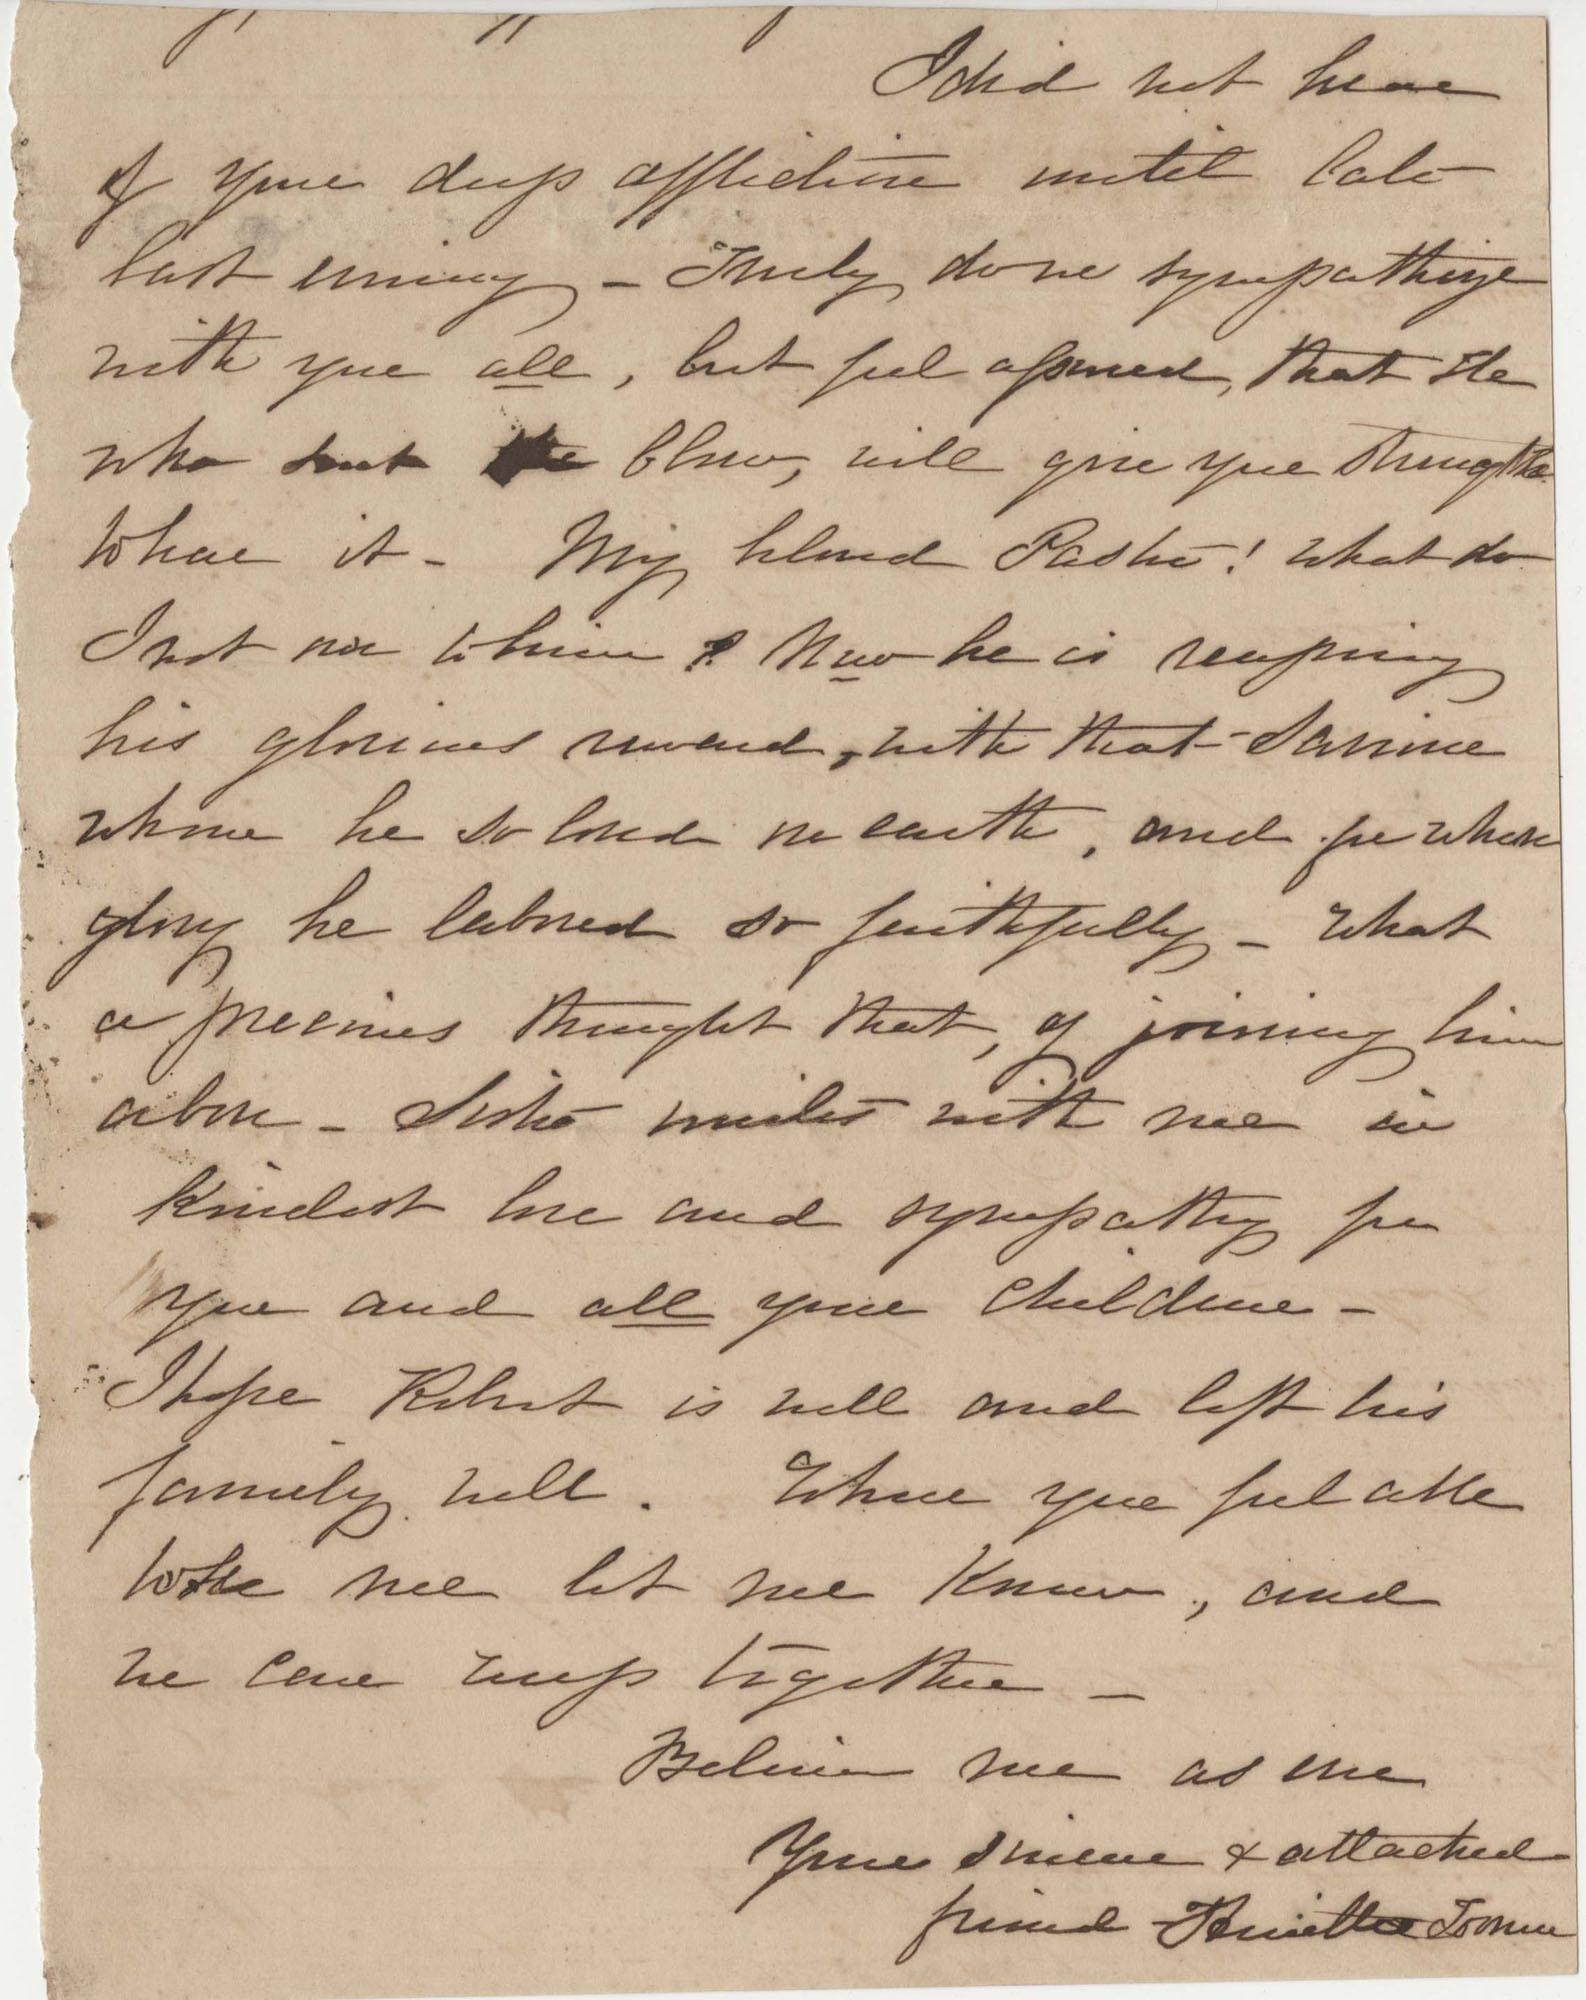 211.  Henrietta Toomer? to Catherine Osborn Barnwell -- 1863